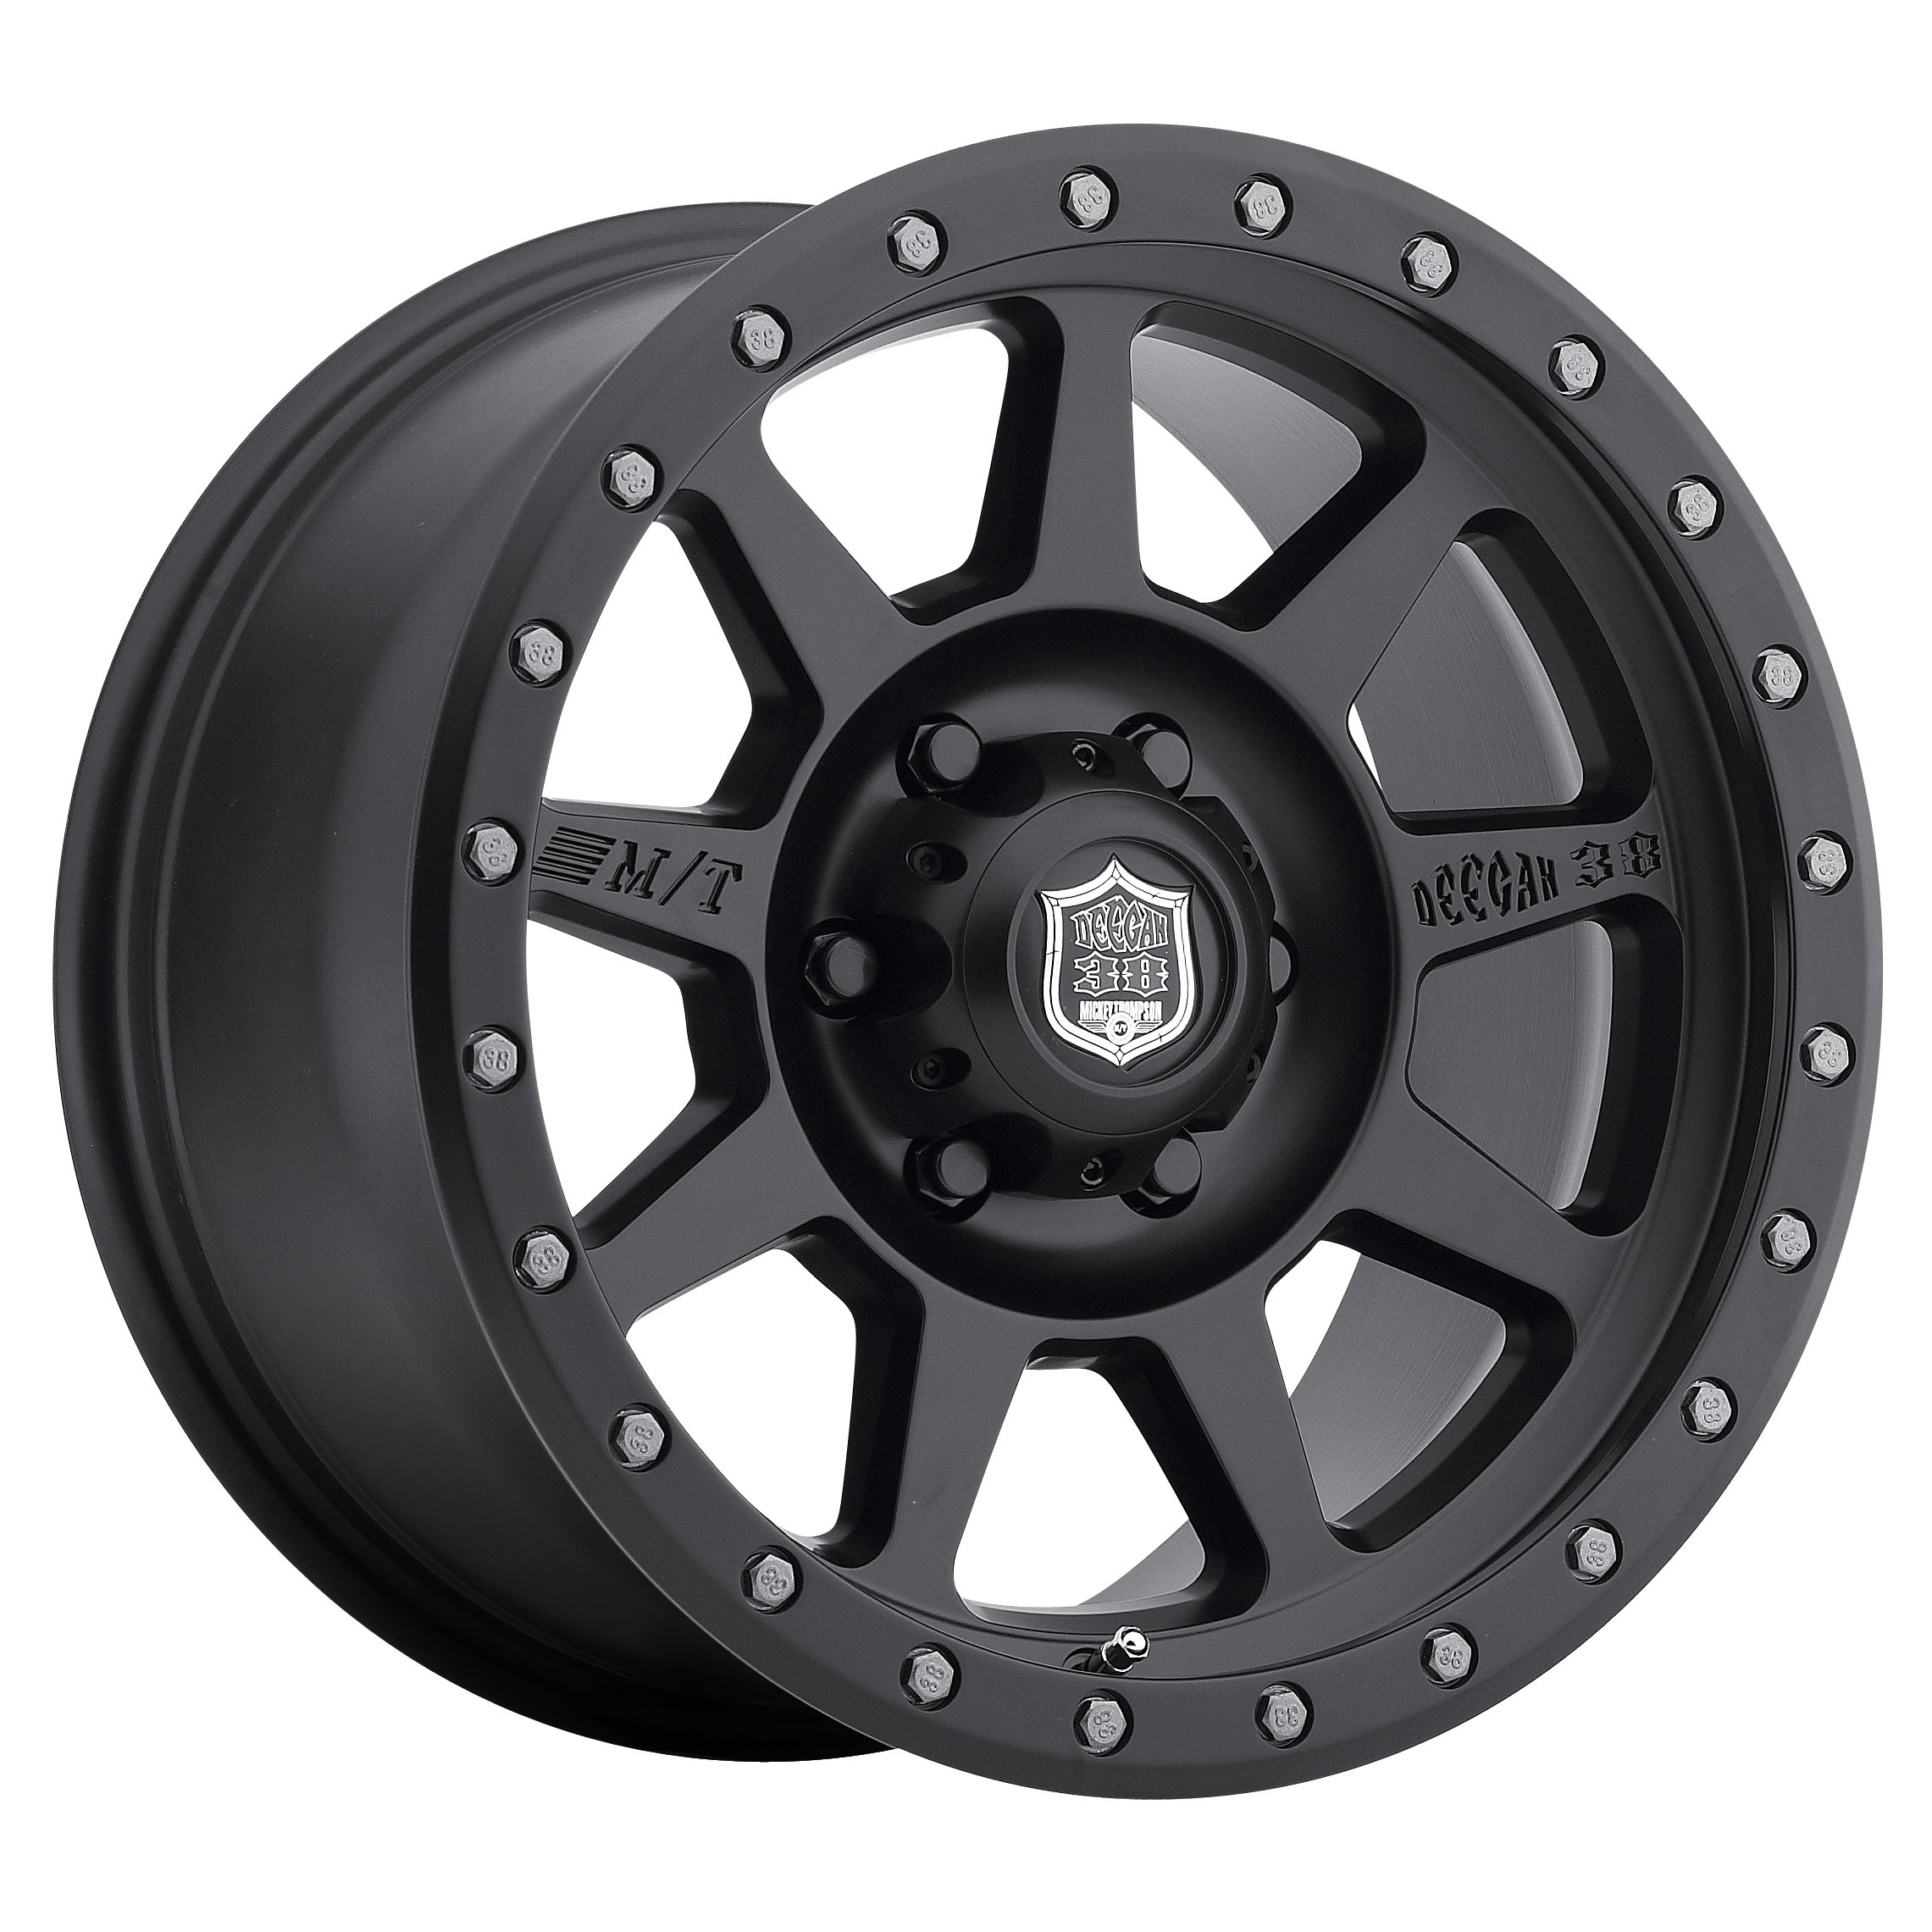 Mickey Thompson Deegan 38 PRO 4 Black Wheel with Matte Black Finish (17x9''/5x5'') -12 millimeters offset